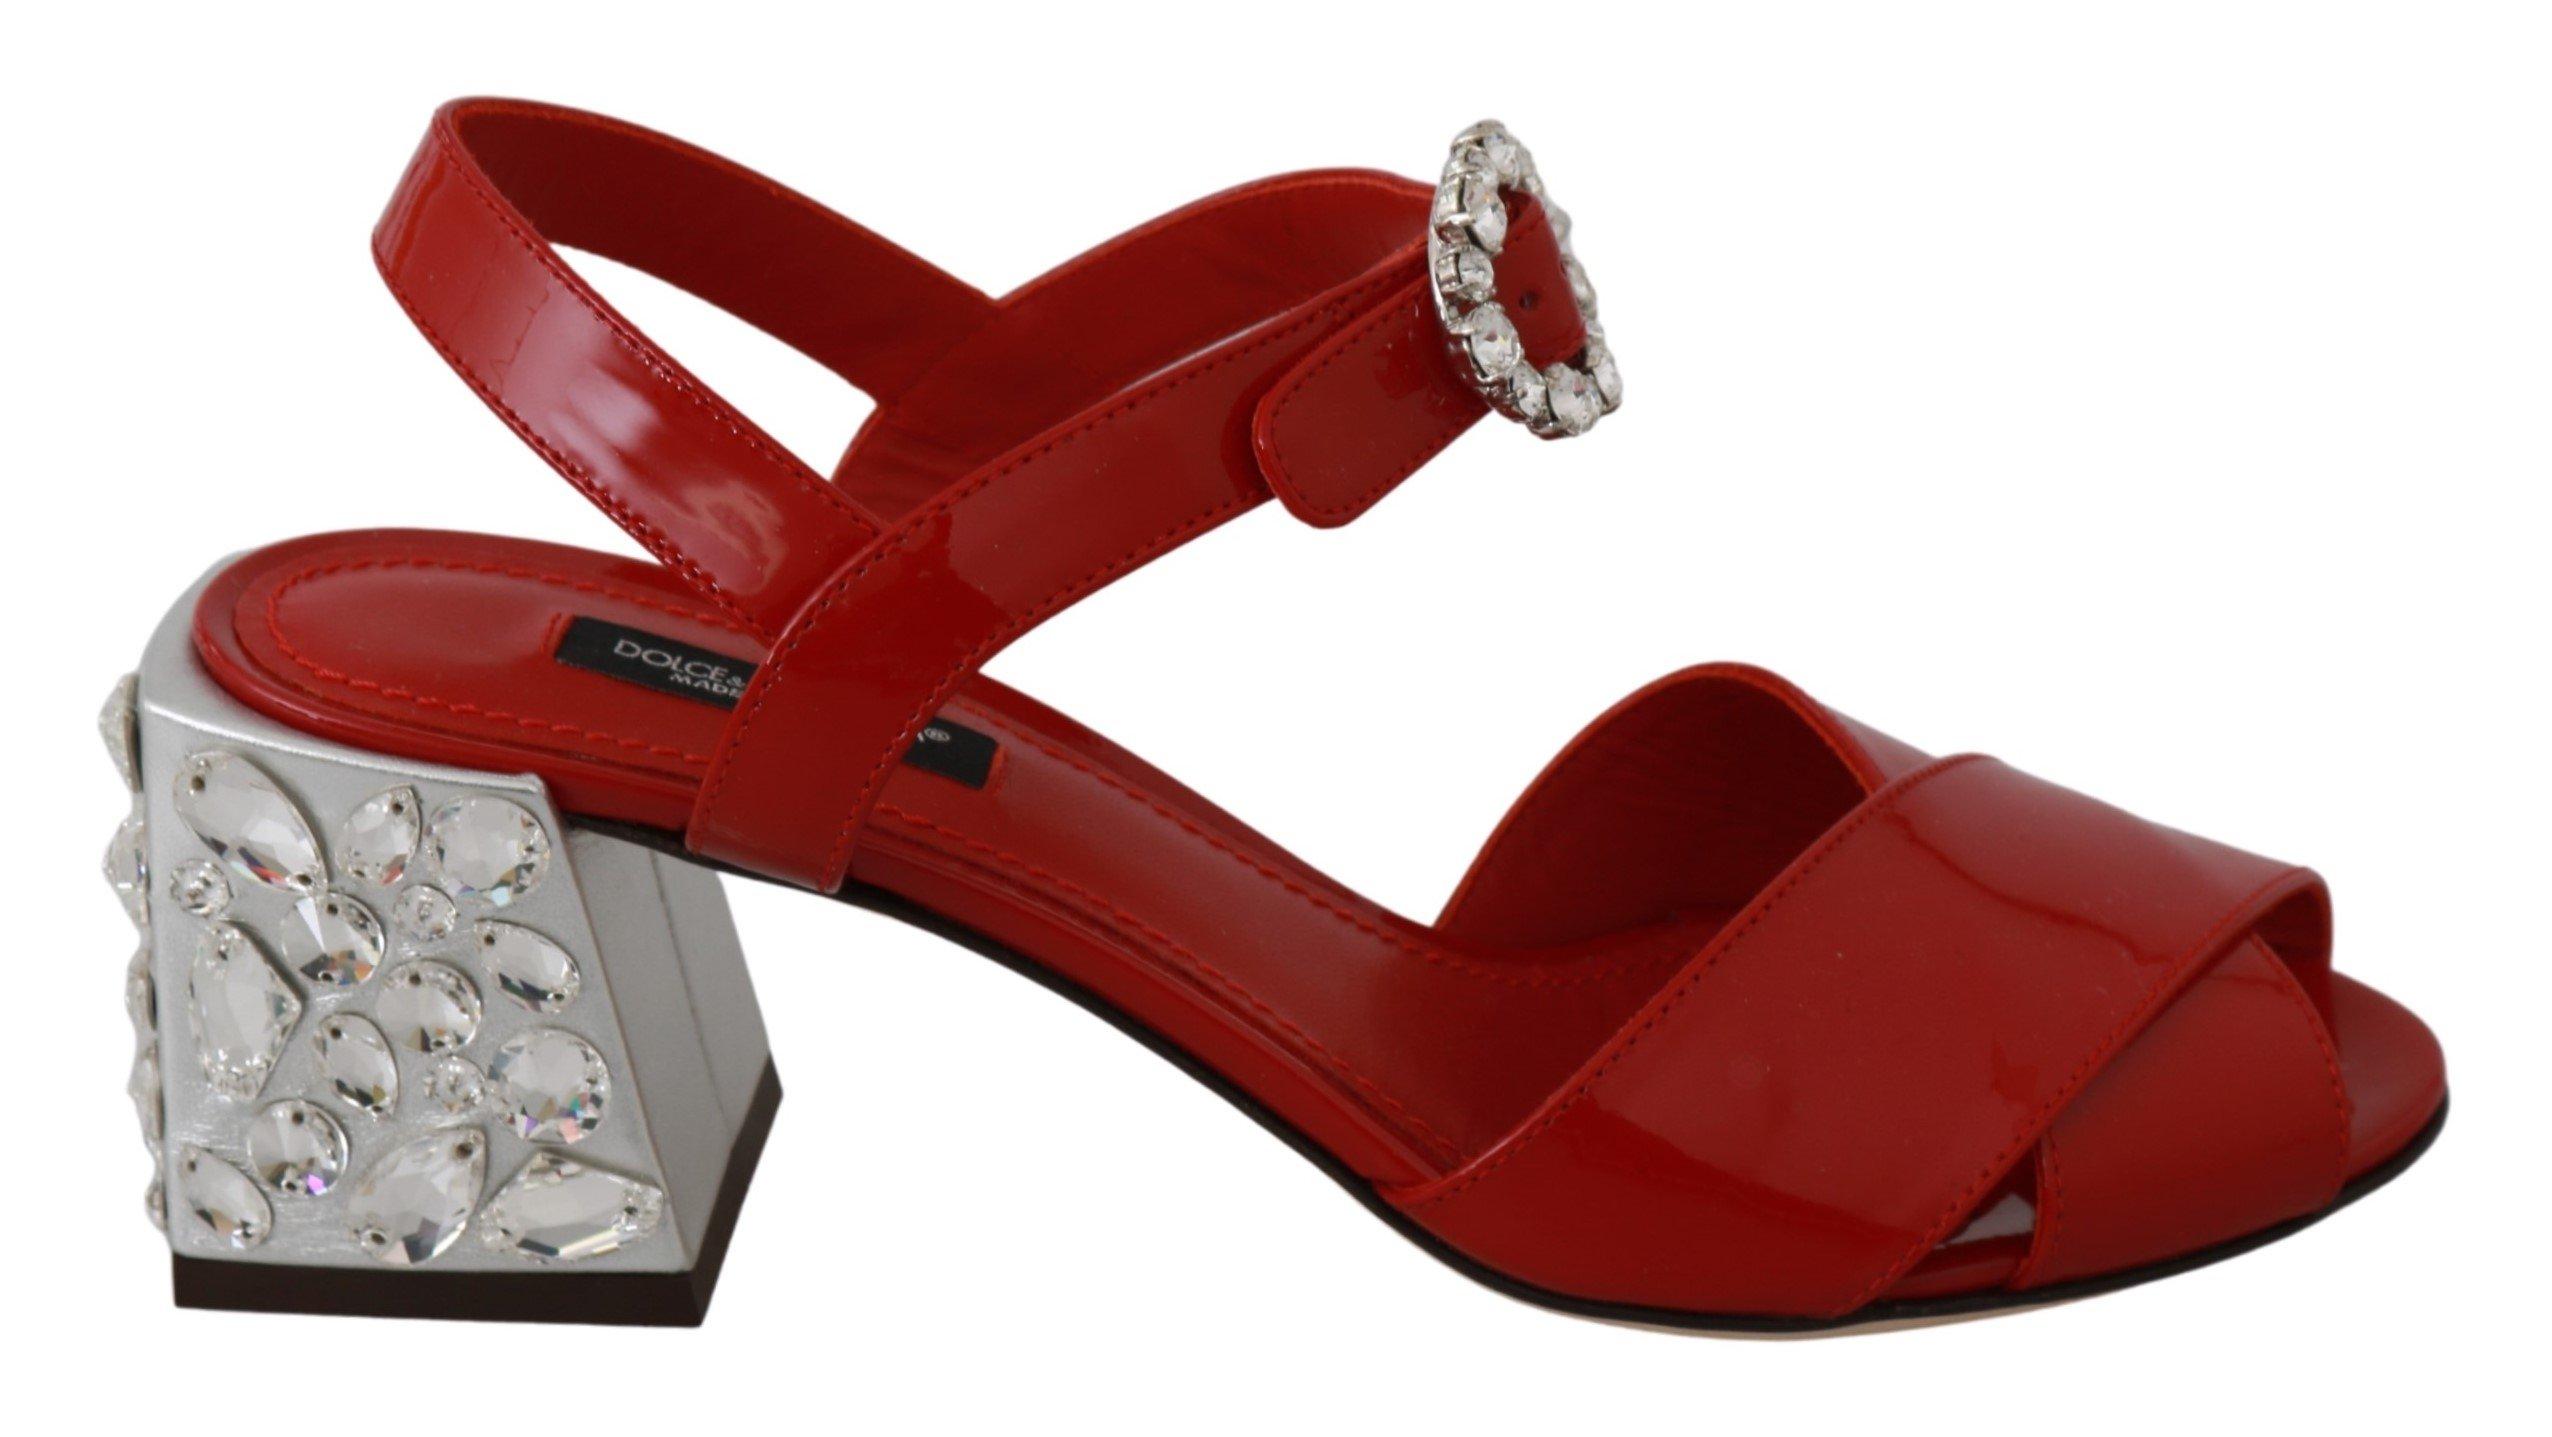 Dolce & Gabbana Women's Patent Leather Crystal Sandals Red LA6463 - EU36/US5.5